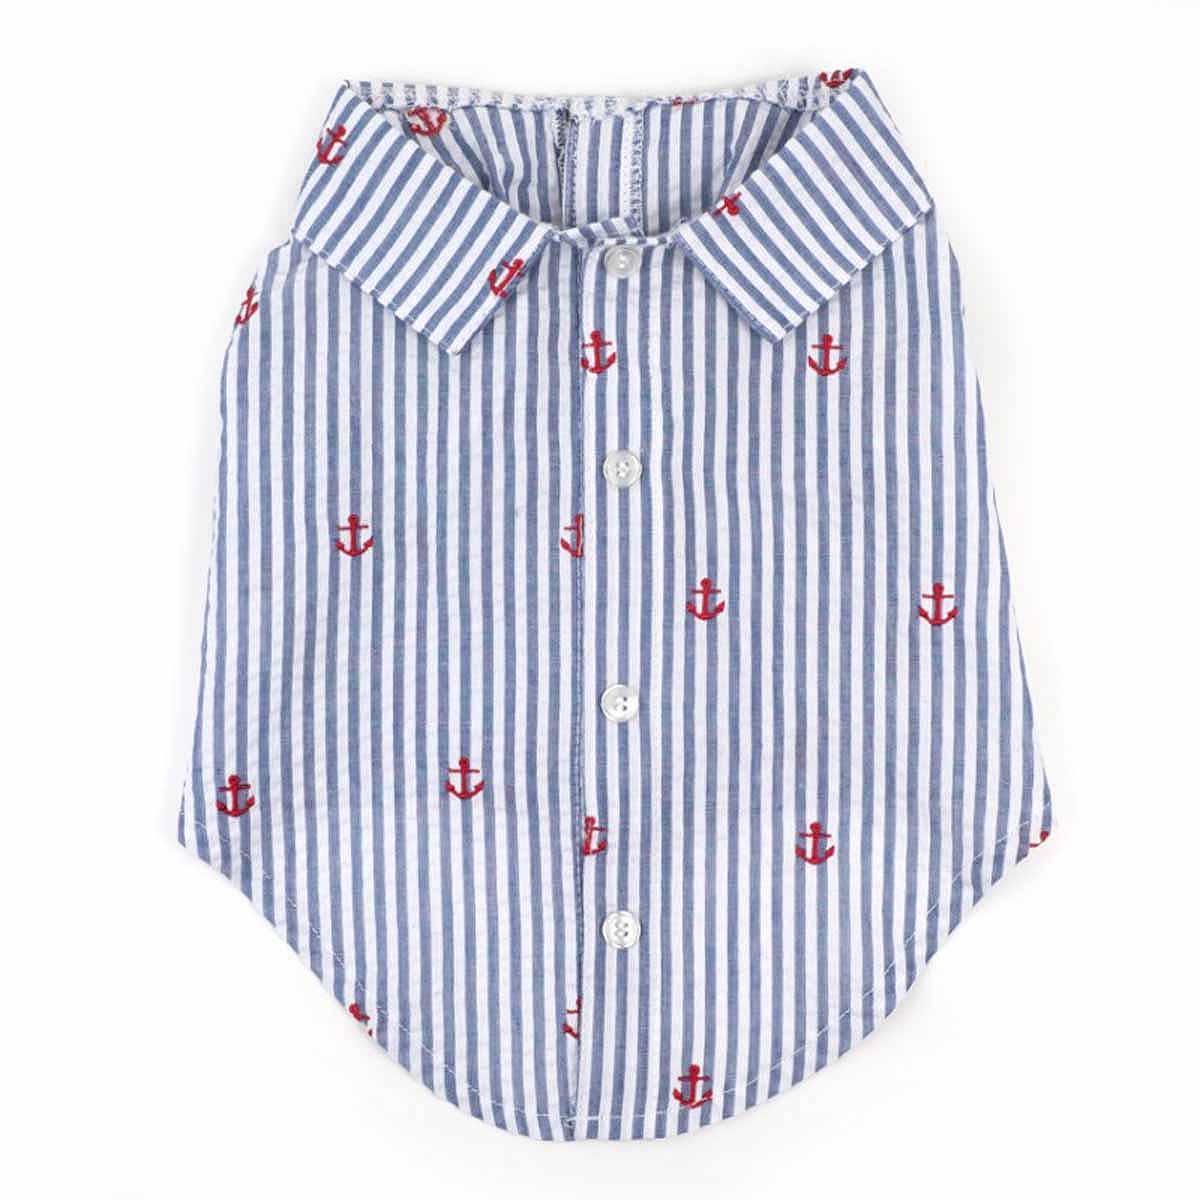 Worthy Dog Navy Stripe Anchor Dog Shirt